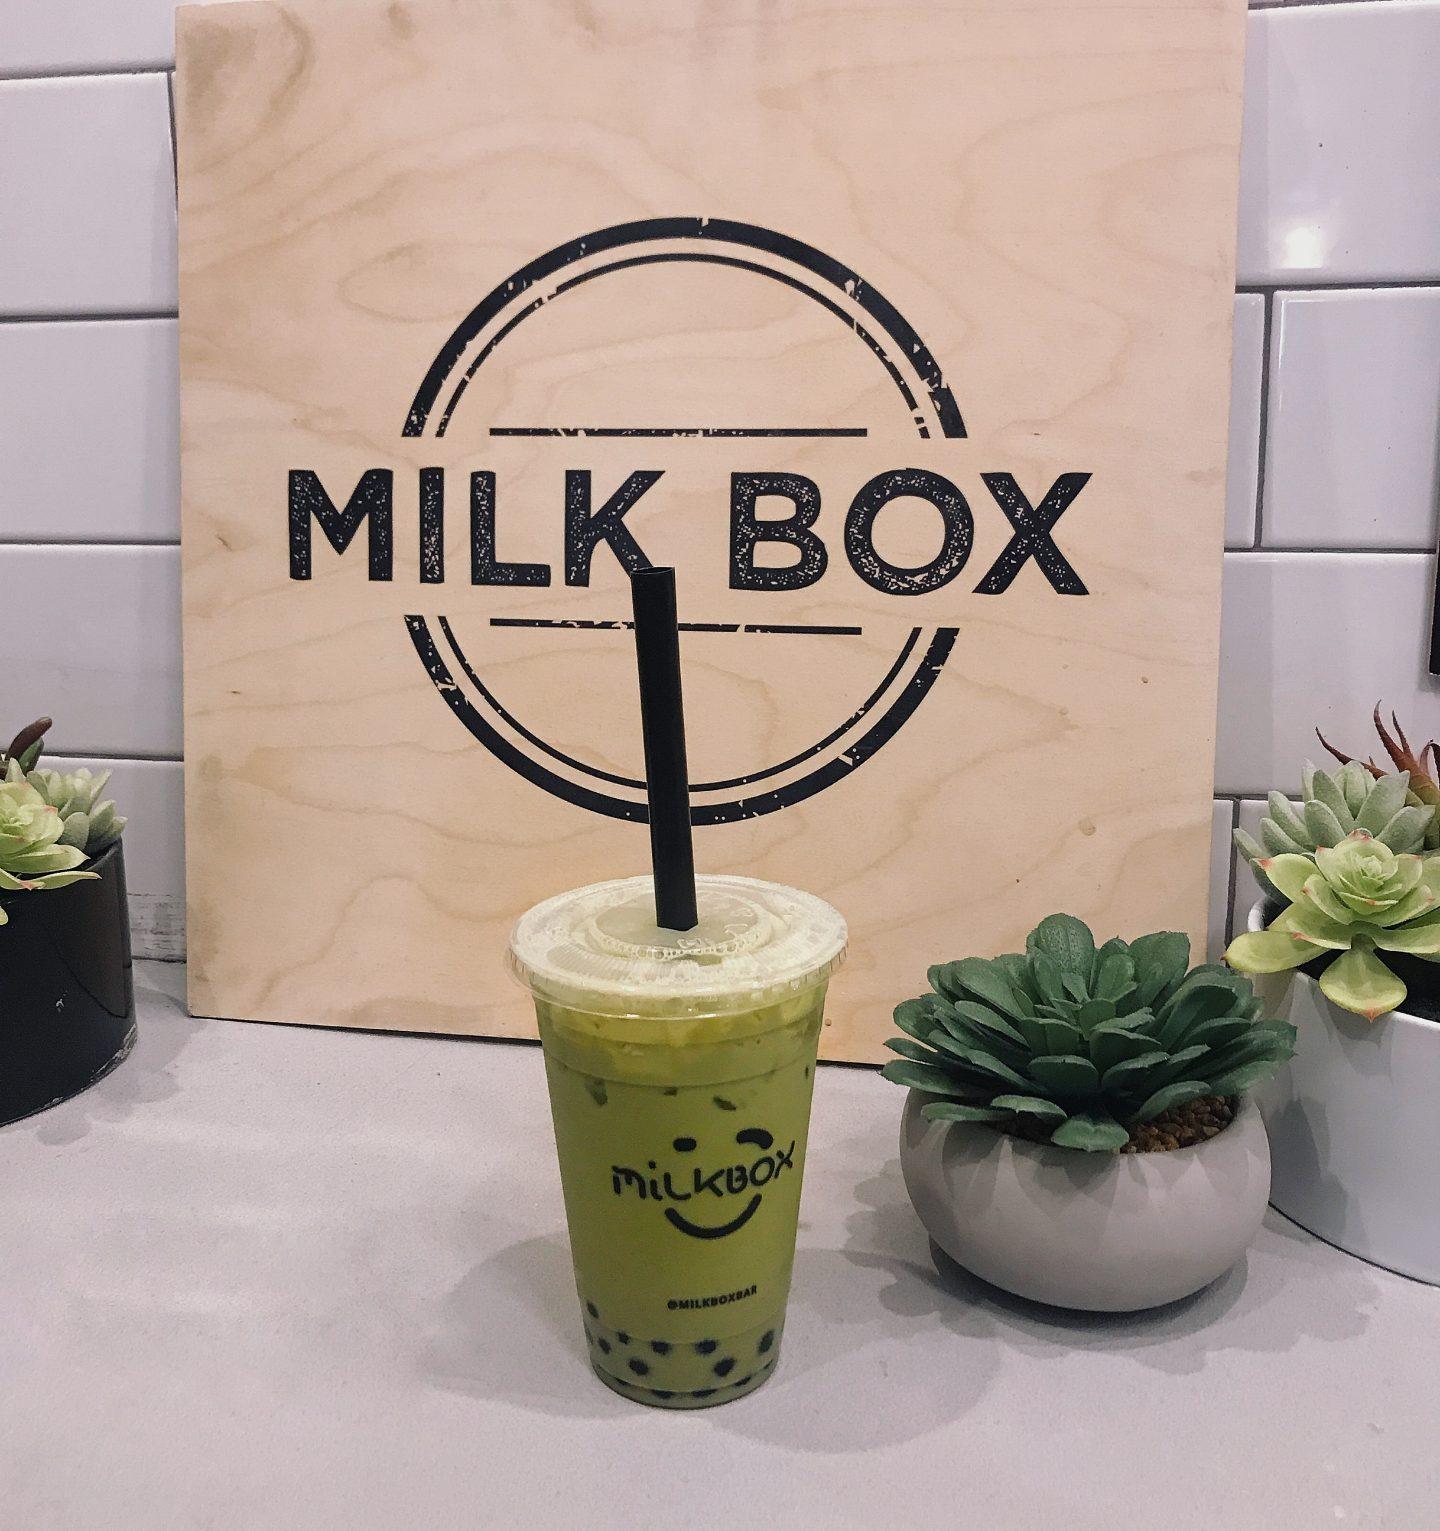 MilkBox Boba – Tustin Union Market